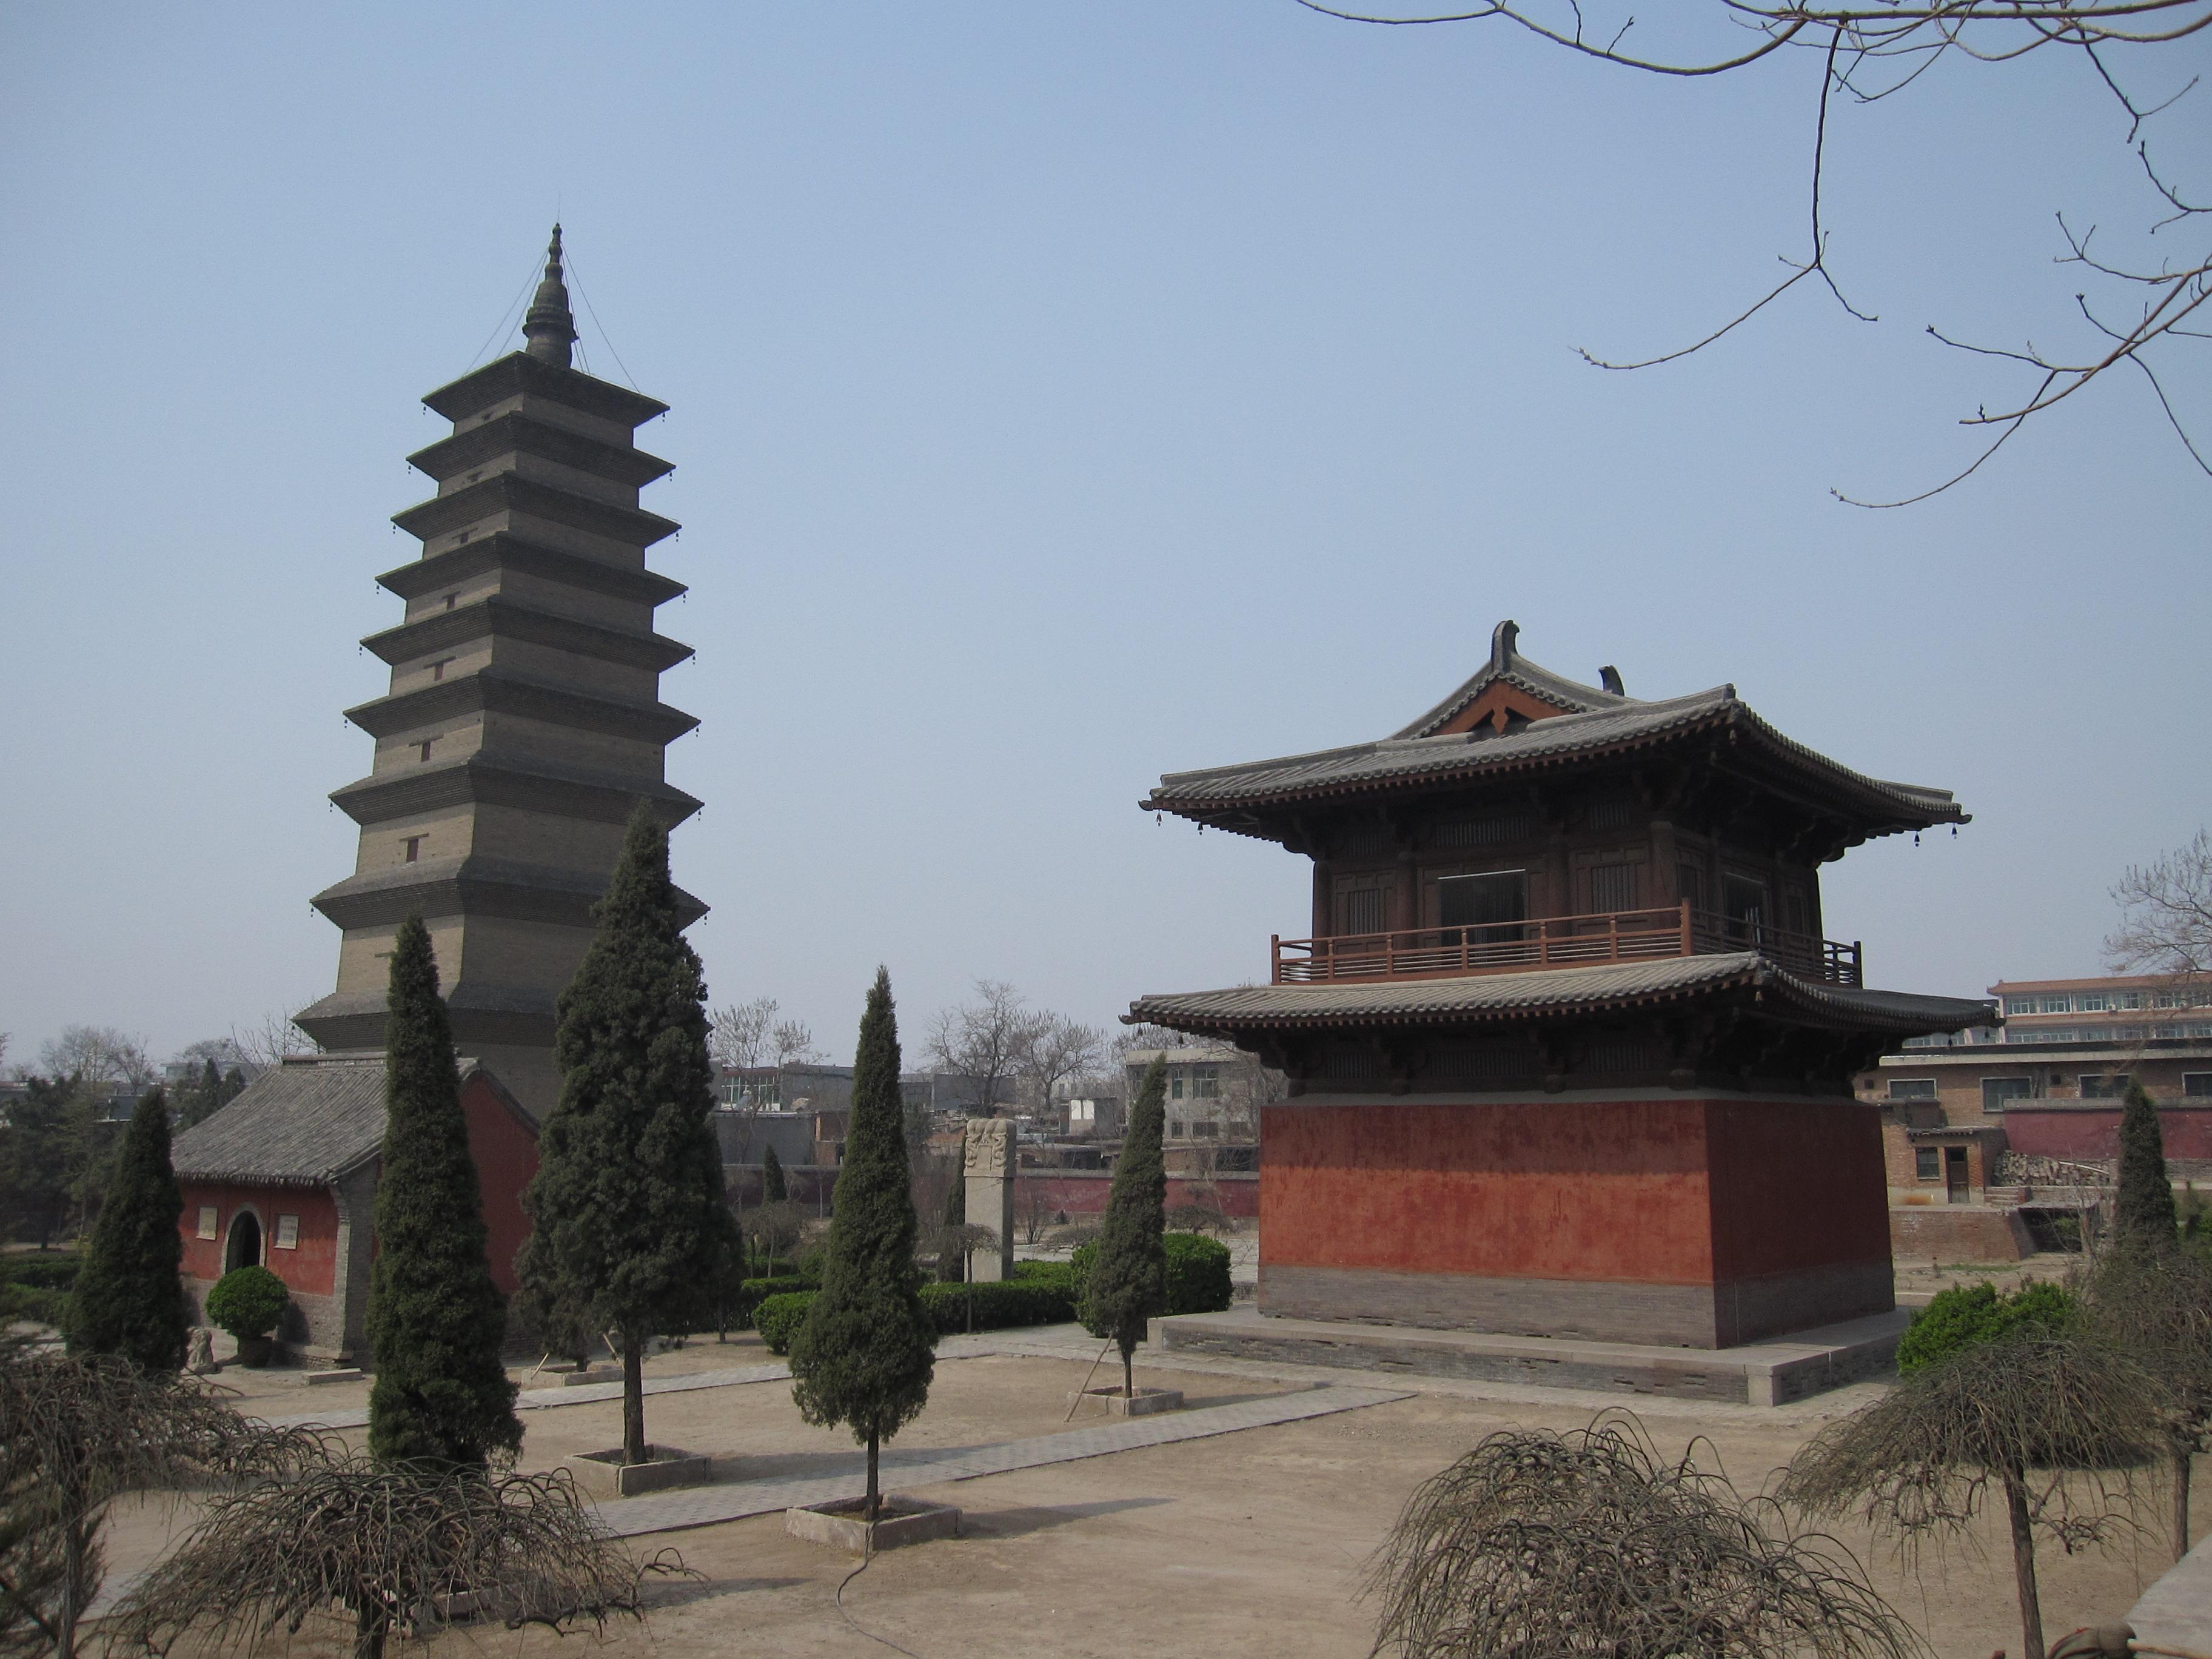 Zhengding_Kaiyuan_Temple_1.jpg (3648×2736)